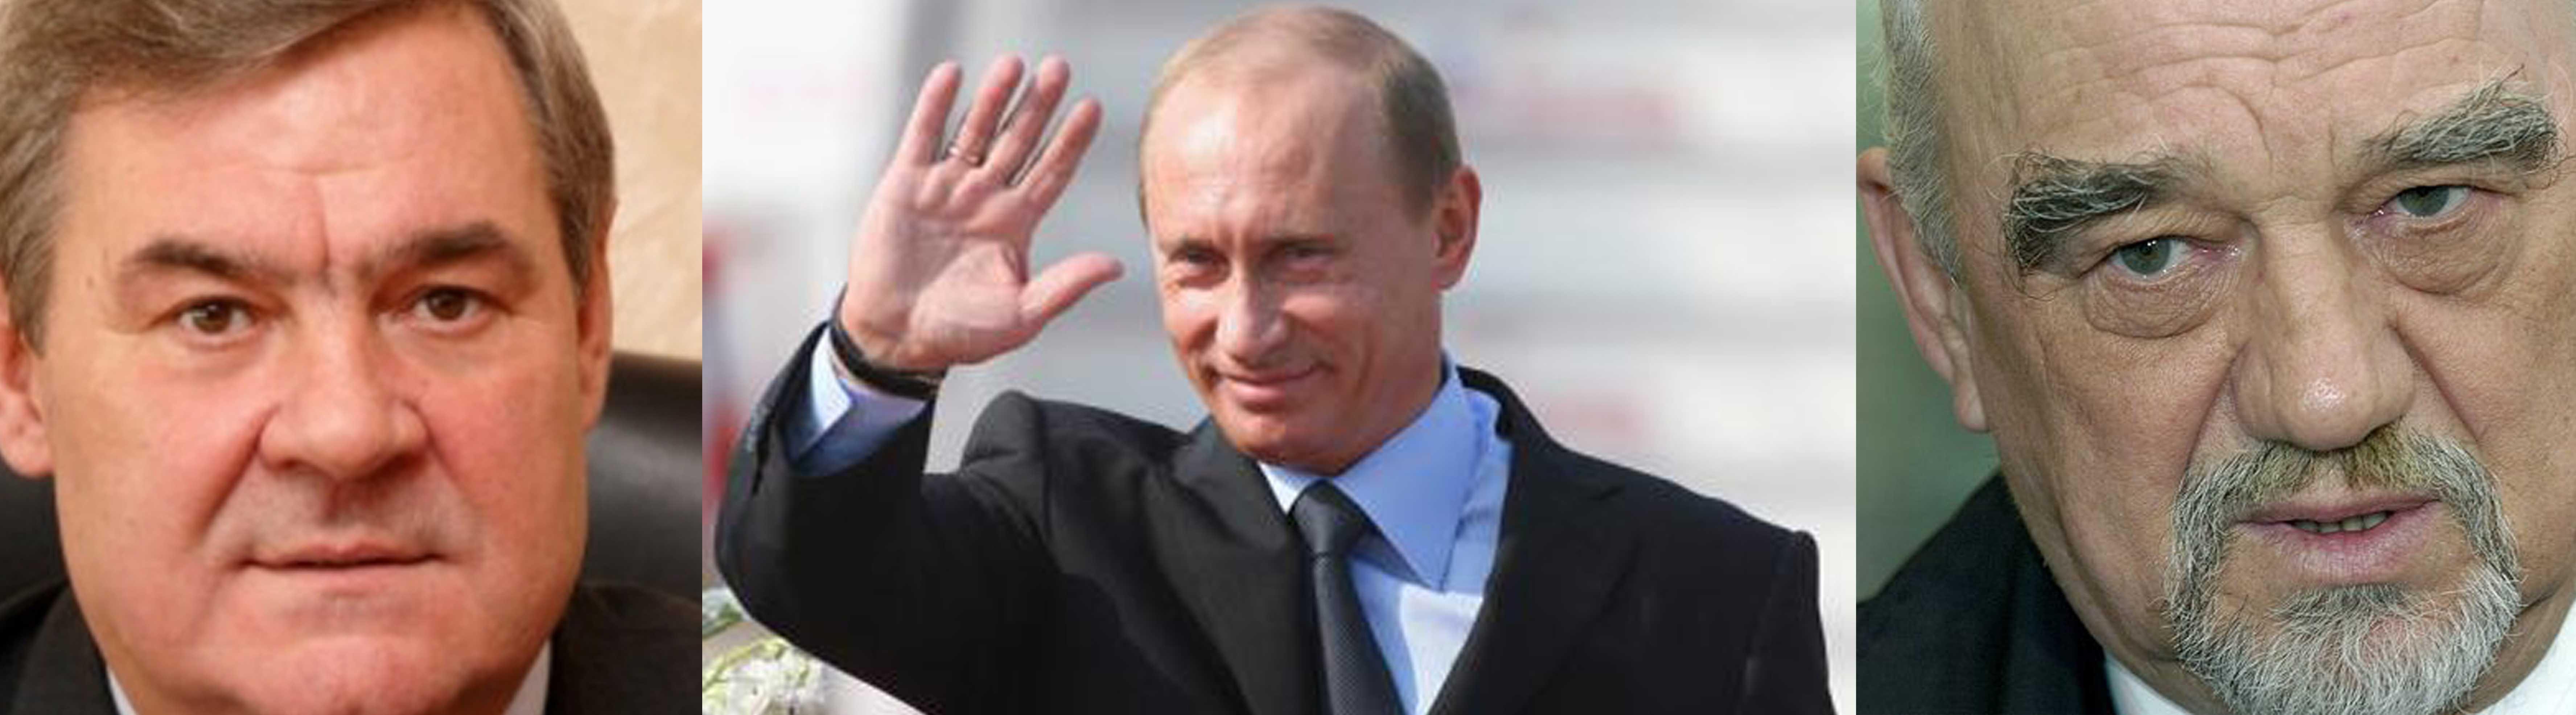 Coincidenta? VLADIMIR PUTIN SE IMPLICA FATIS IN NUMIREA VIITORULUI LIDER DE LA TIRASPOL (TRANSNISTRIA). <i>Tensiuni diplomatice intre Chisinau si Moscova</i>